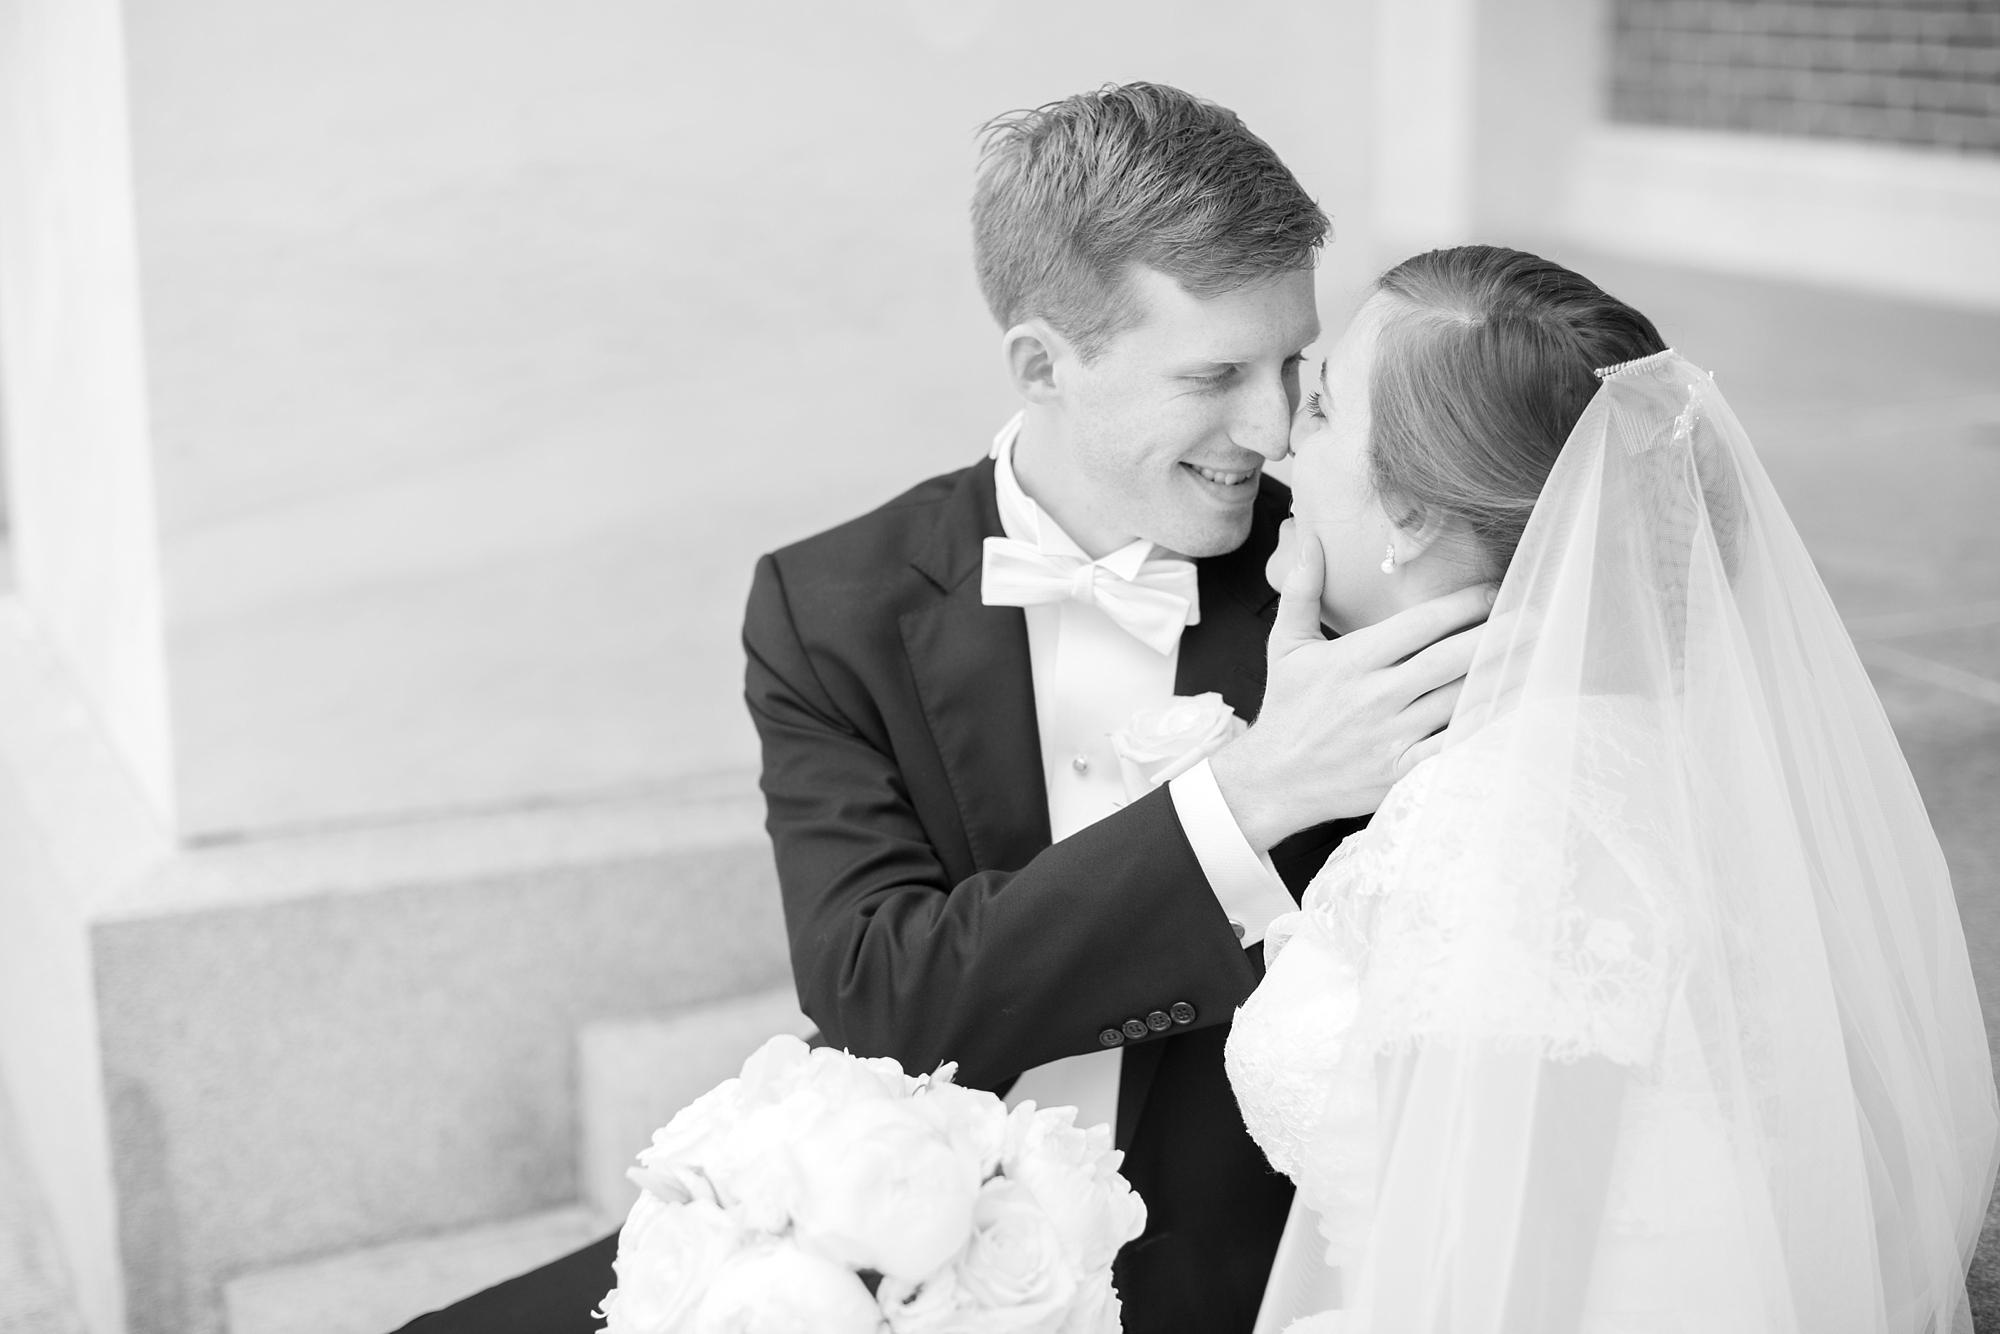 Somerville 4-Bride & Groom Portraits-979_anna grace photography sherwood forest annapolis maryland wedding photographer photo.jpg